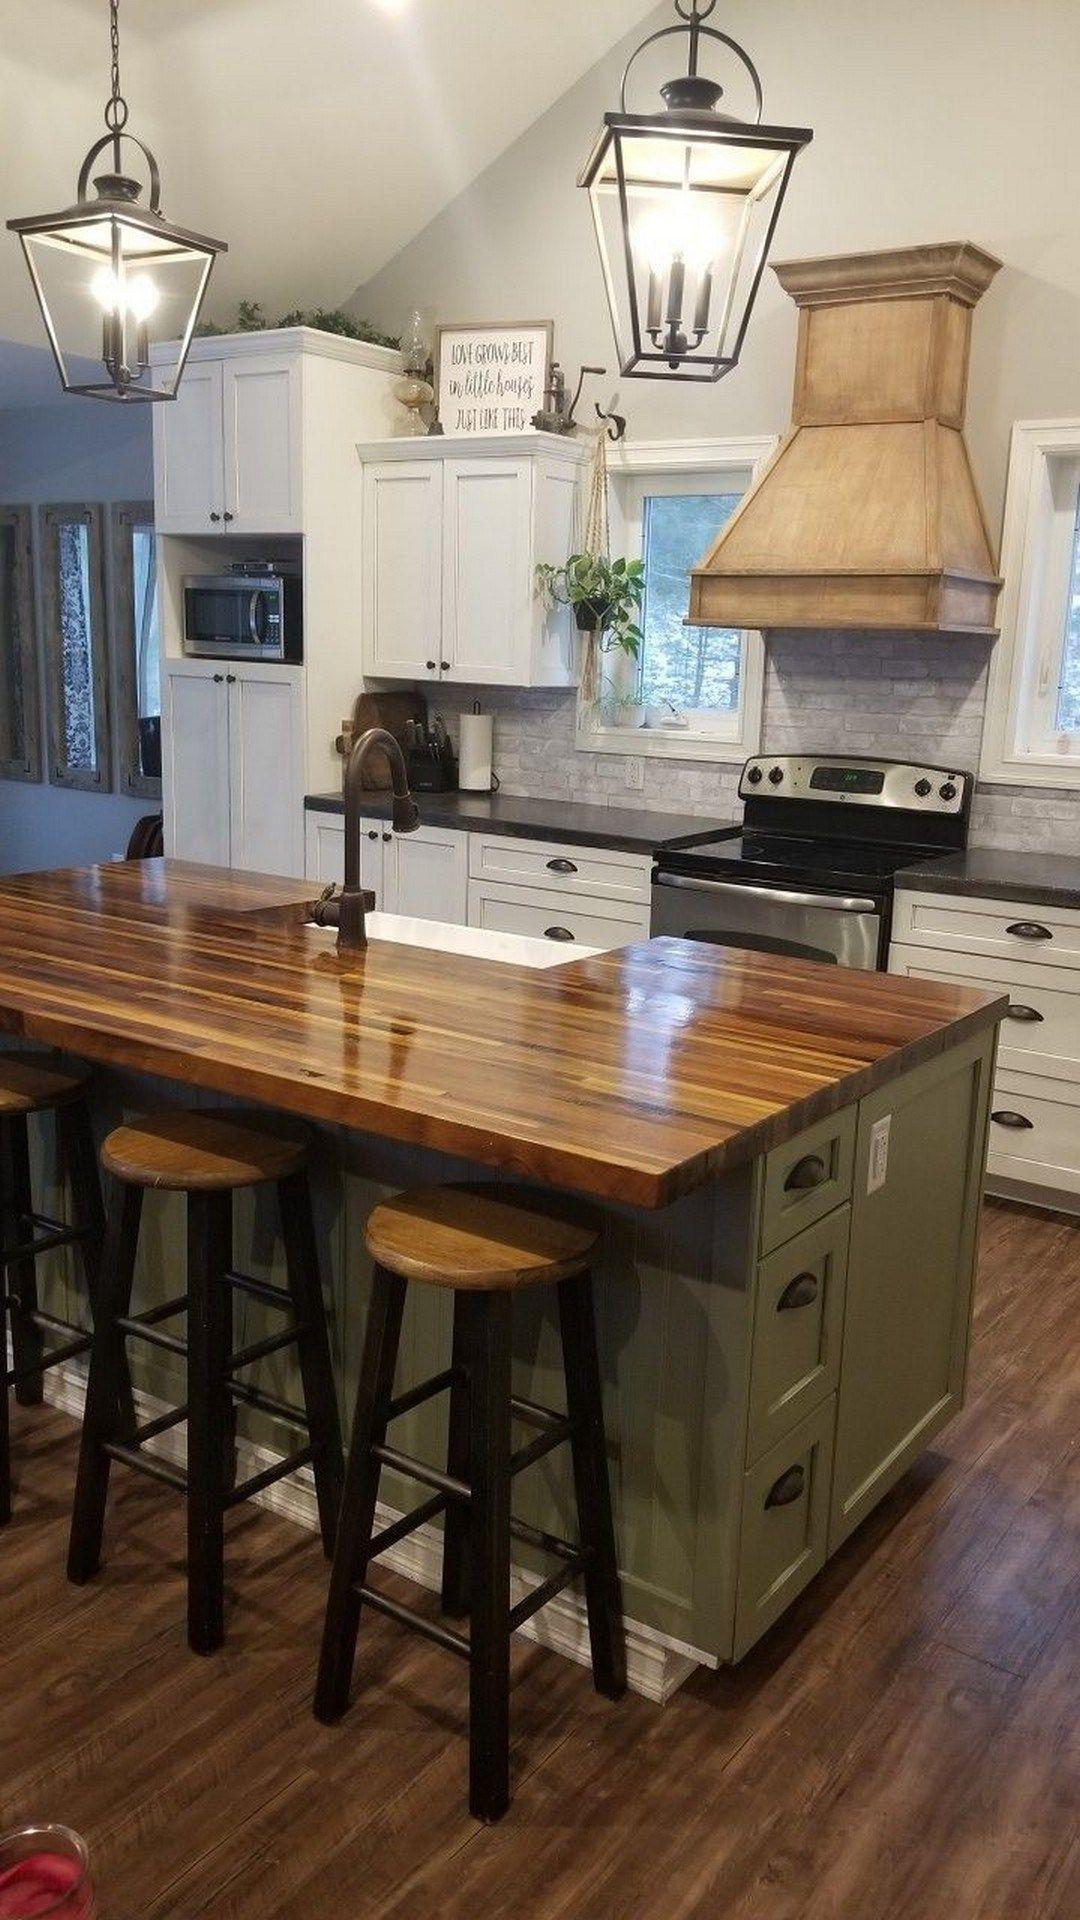 52 Farmhouse Sink Pros Cons Farmhouse Room In 2020 Kitchen Island With Sink Square Kitchen Layout Farmhouse Kitchen Island